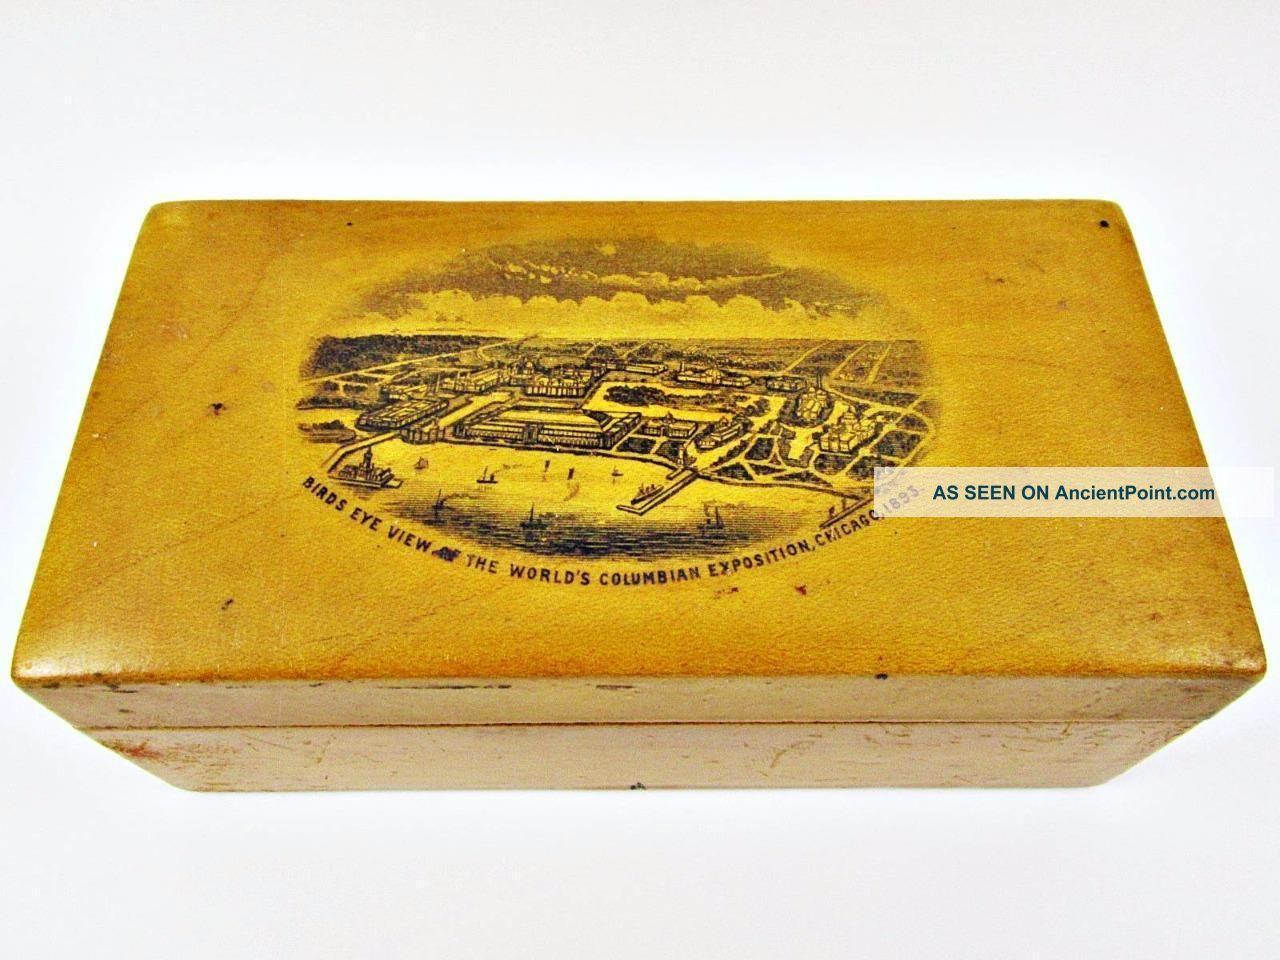 1893 Columbian Expo Chicago World ' S Fair Souvenir Spool Thread Box Sewing Kit Baskets & Boxes photo